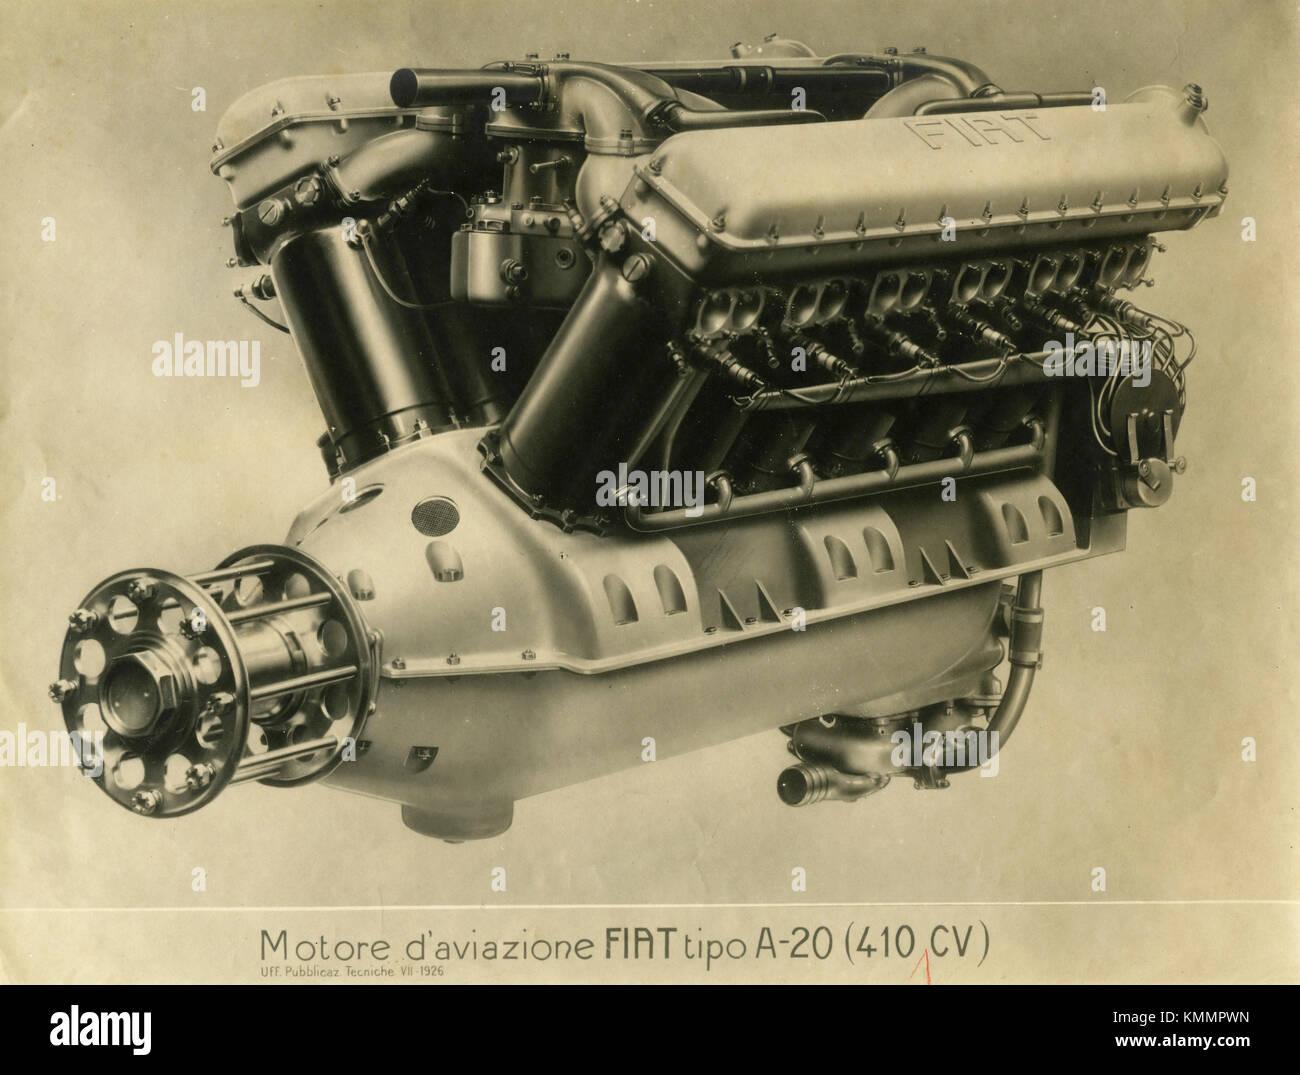 FIAT aviation engine A.20 HP 410, Italy 1920s - Stock Image